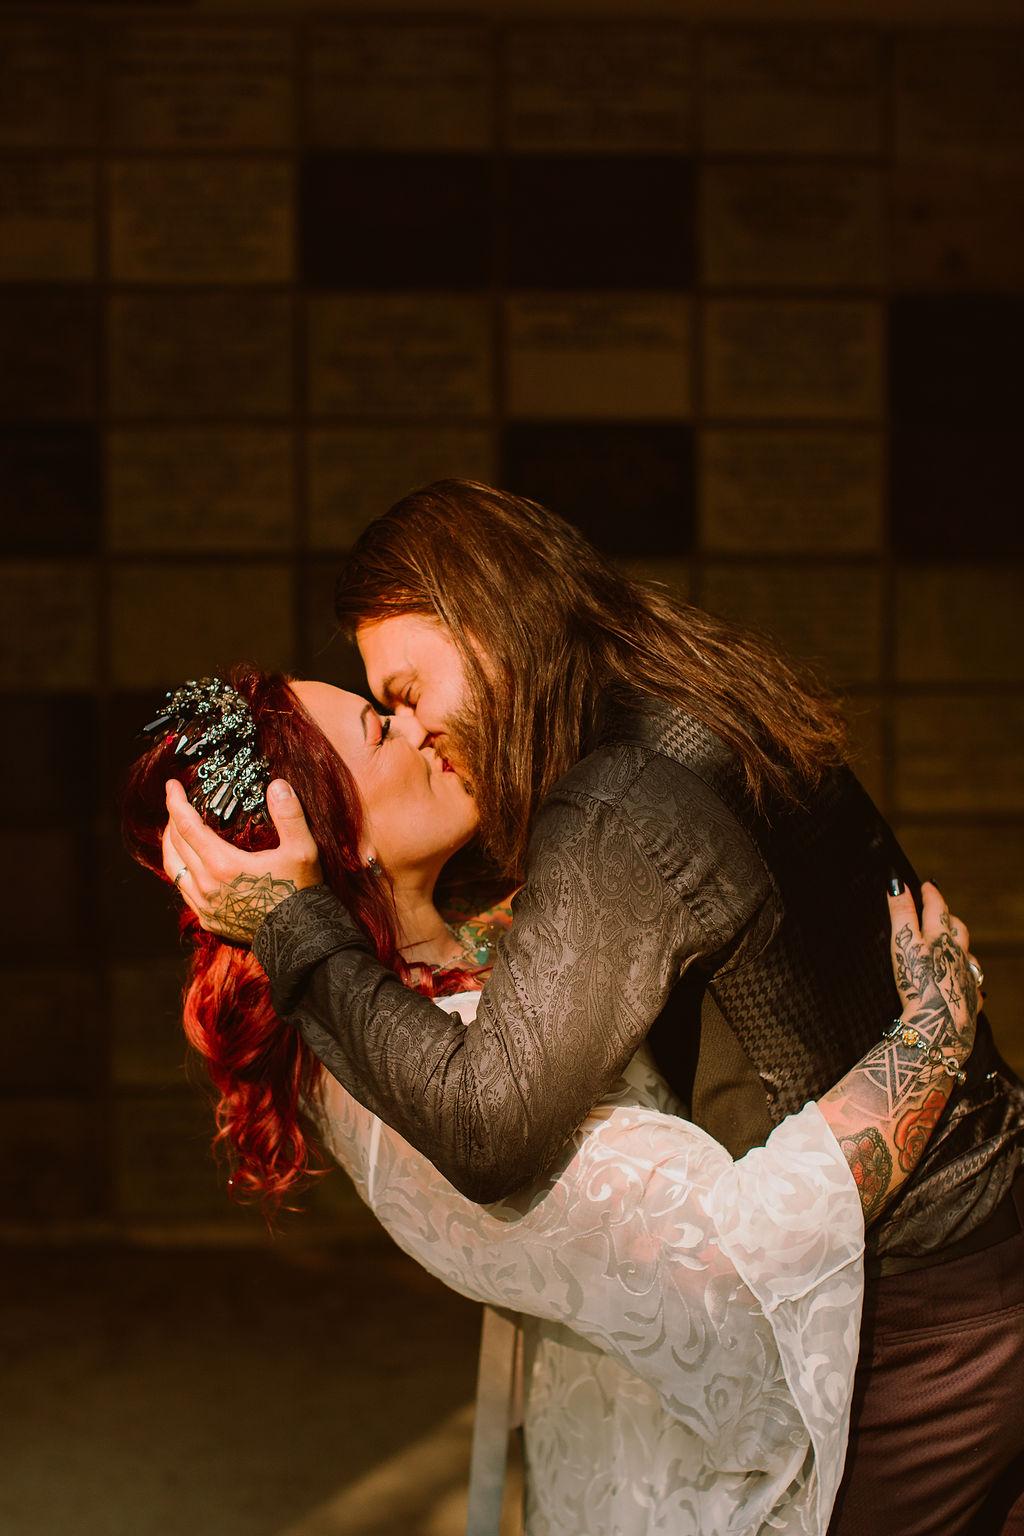 alternative micro wedding - bride and groom kiss - edgy wedding